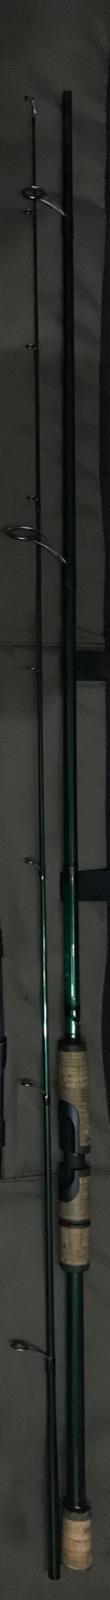 [VENDO] G.Loomis GLX 984-2S 612